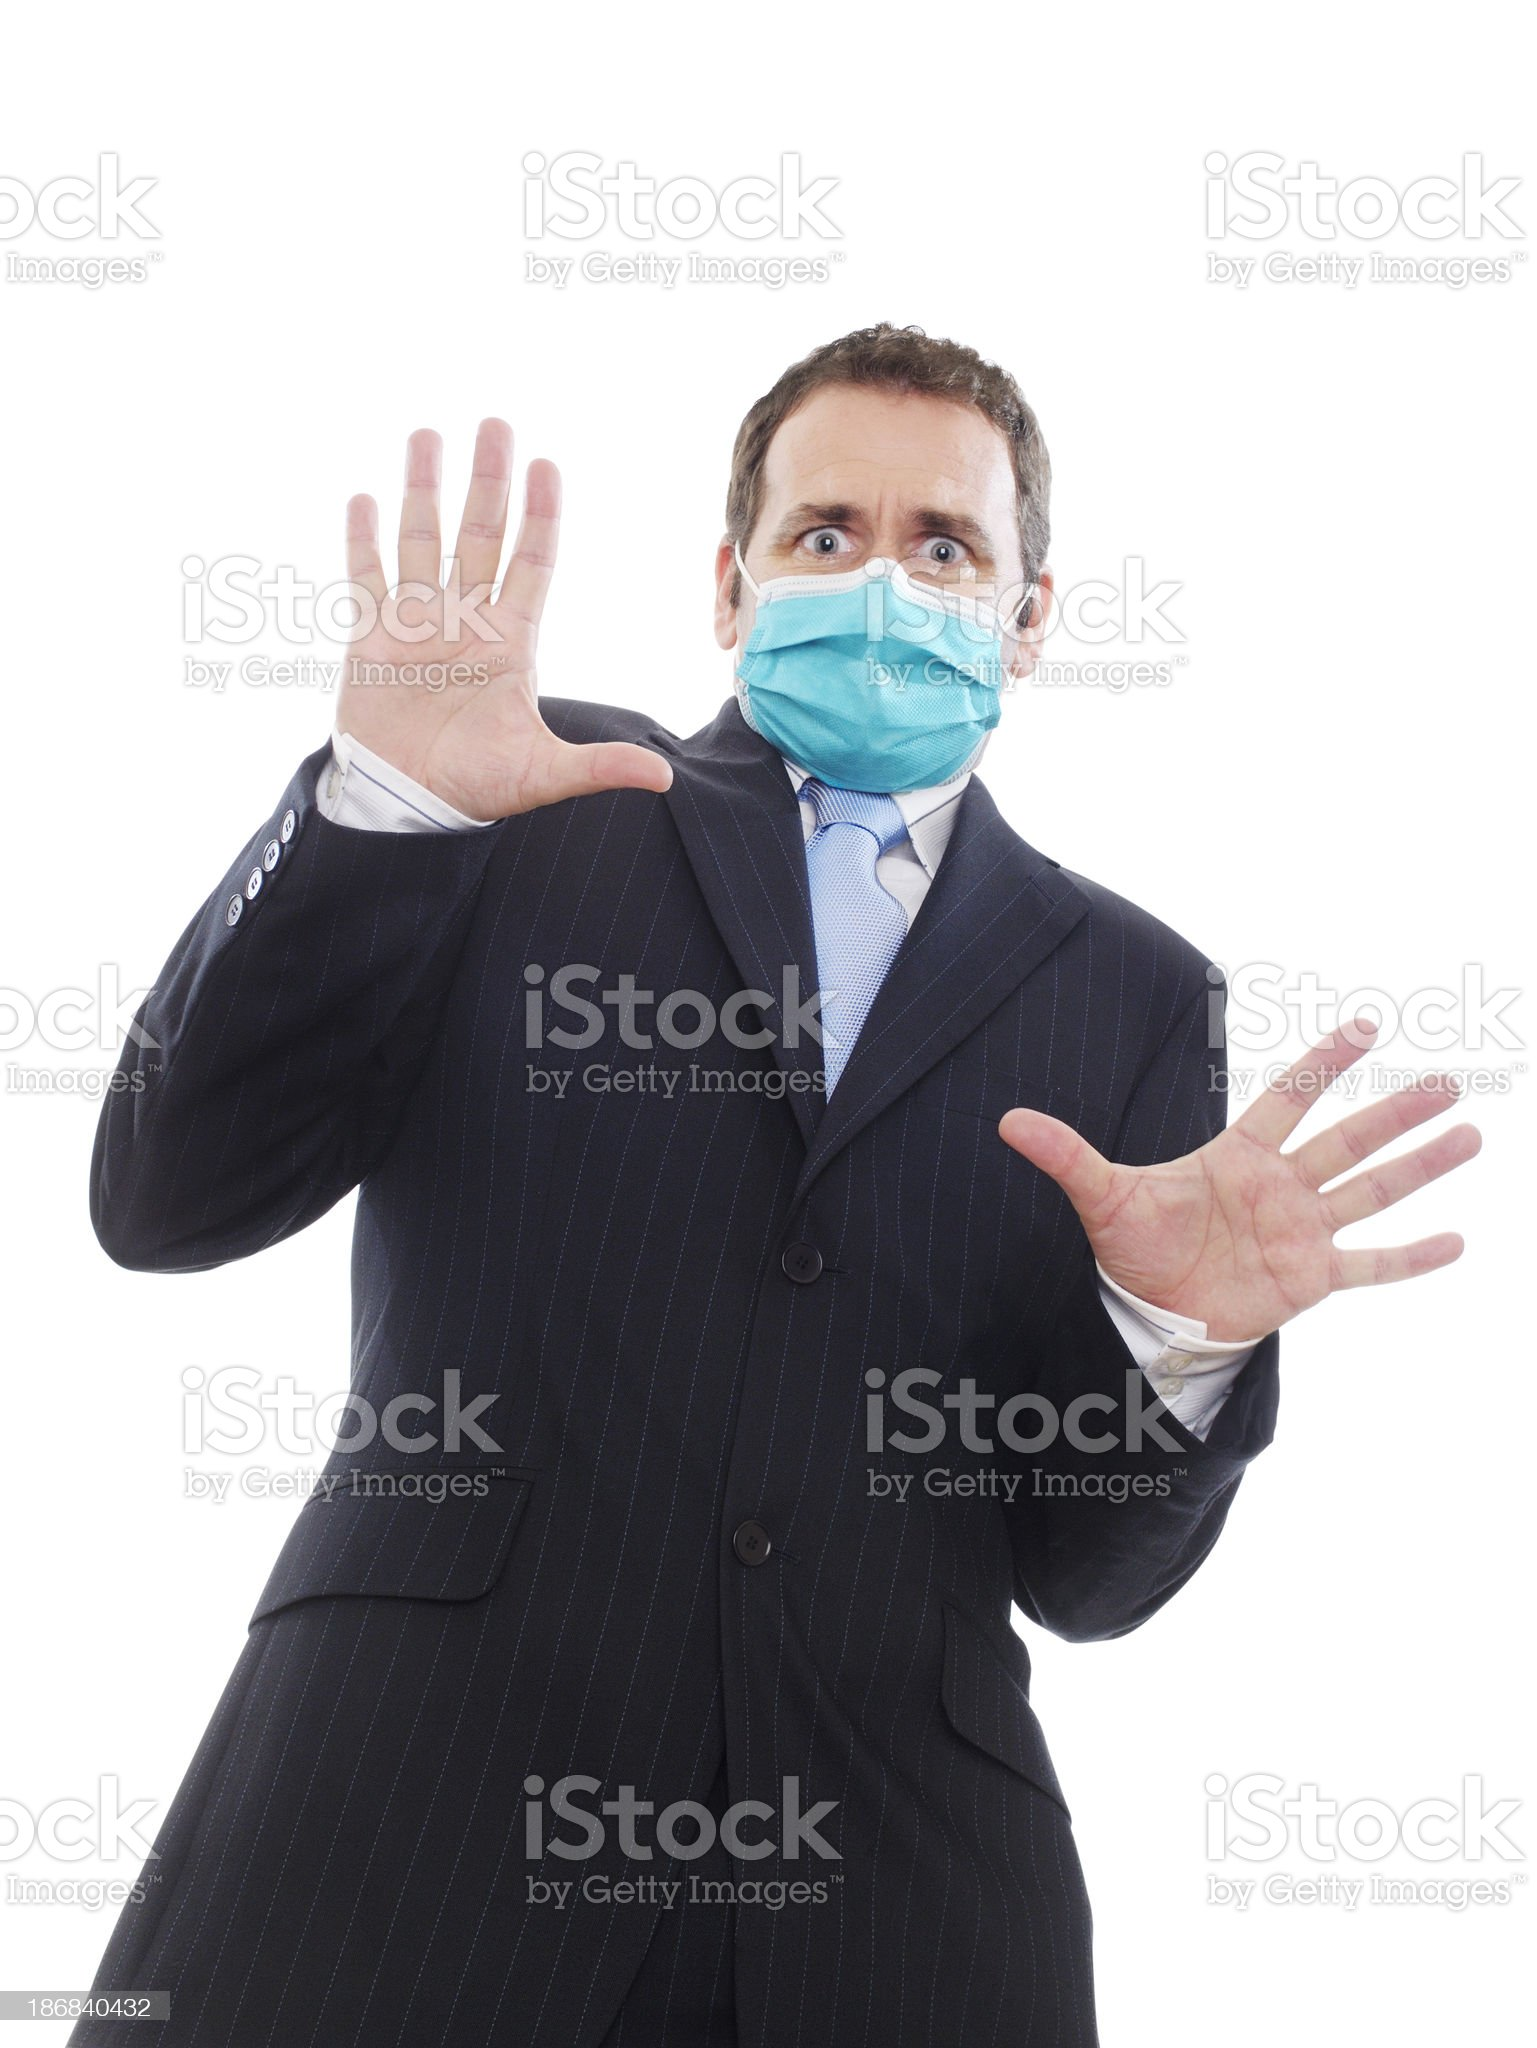 Virus paranoia royalty-free stock photo